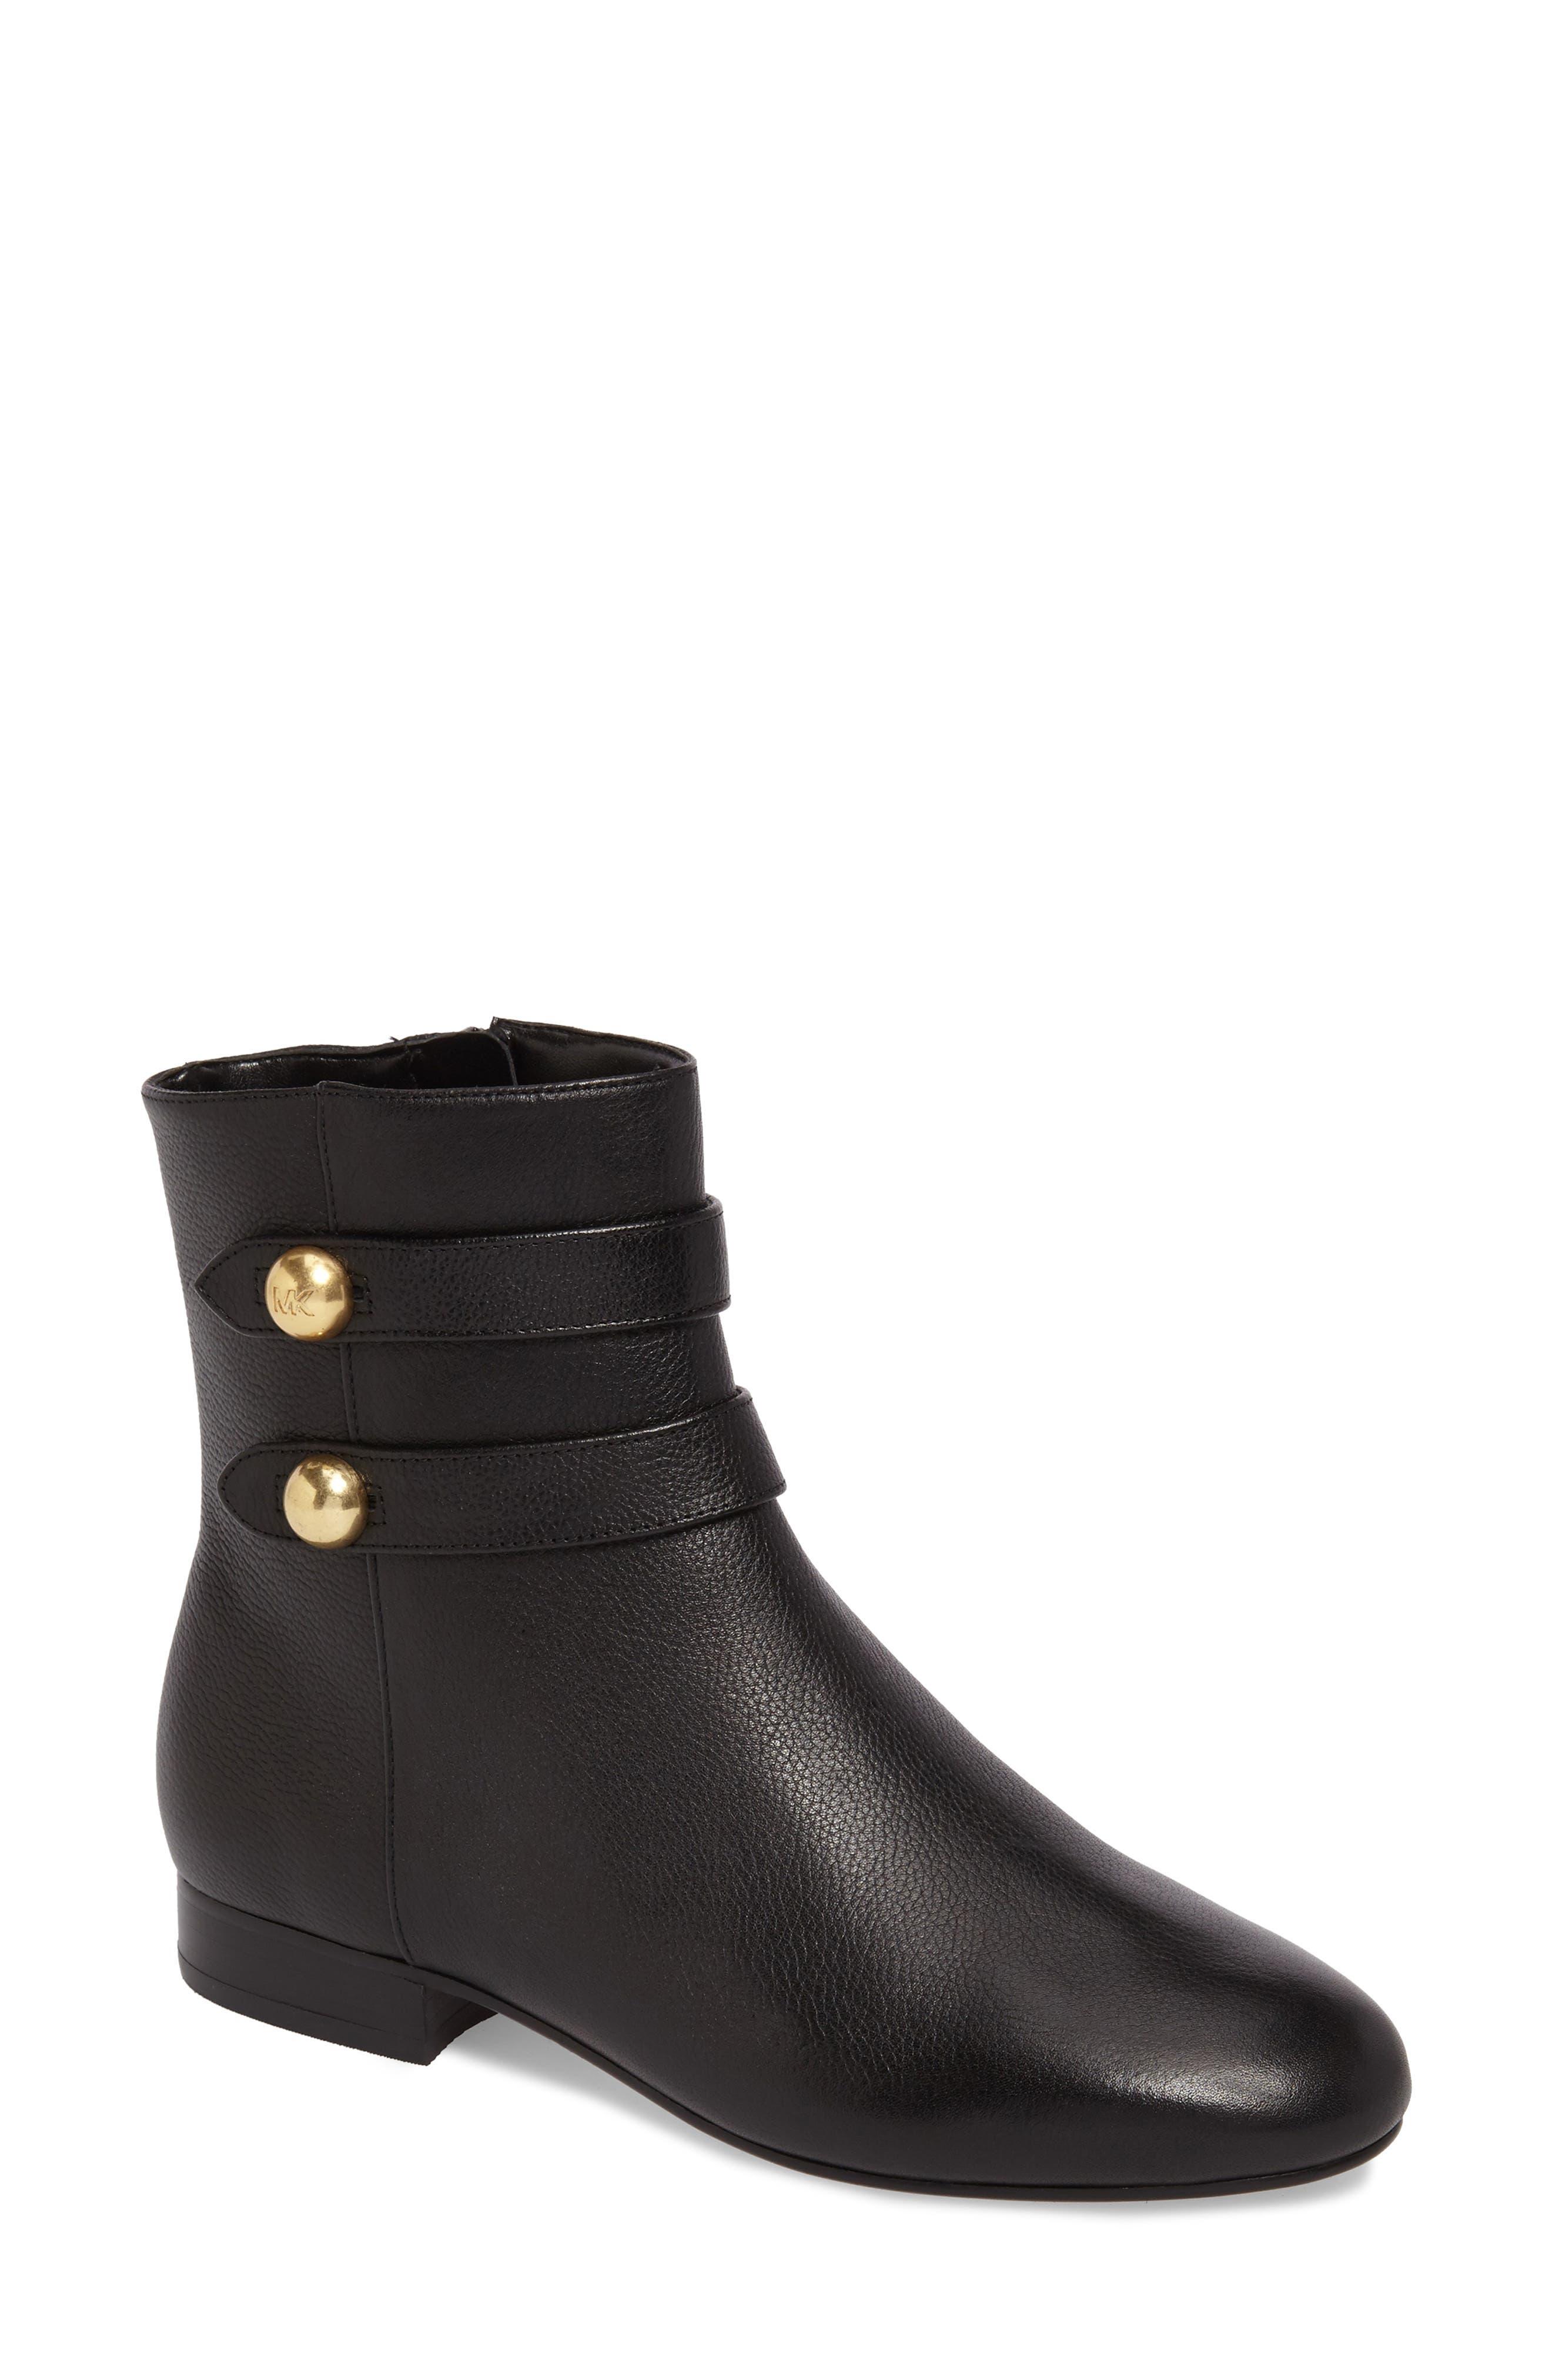 Maisie Bootie,                             Main thumbnail 1, color,                             Black Tumbled Leather